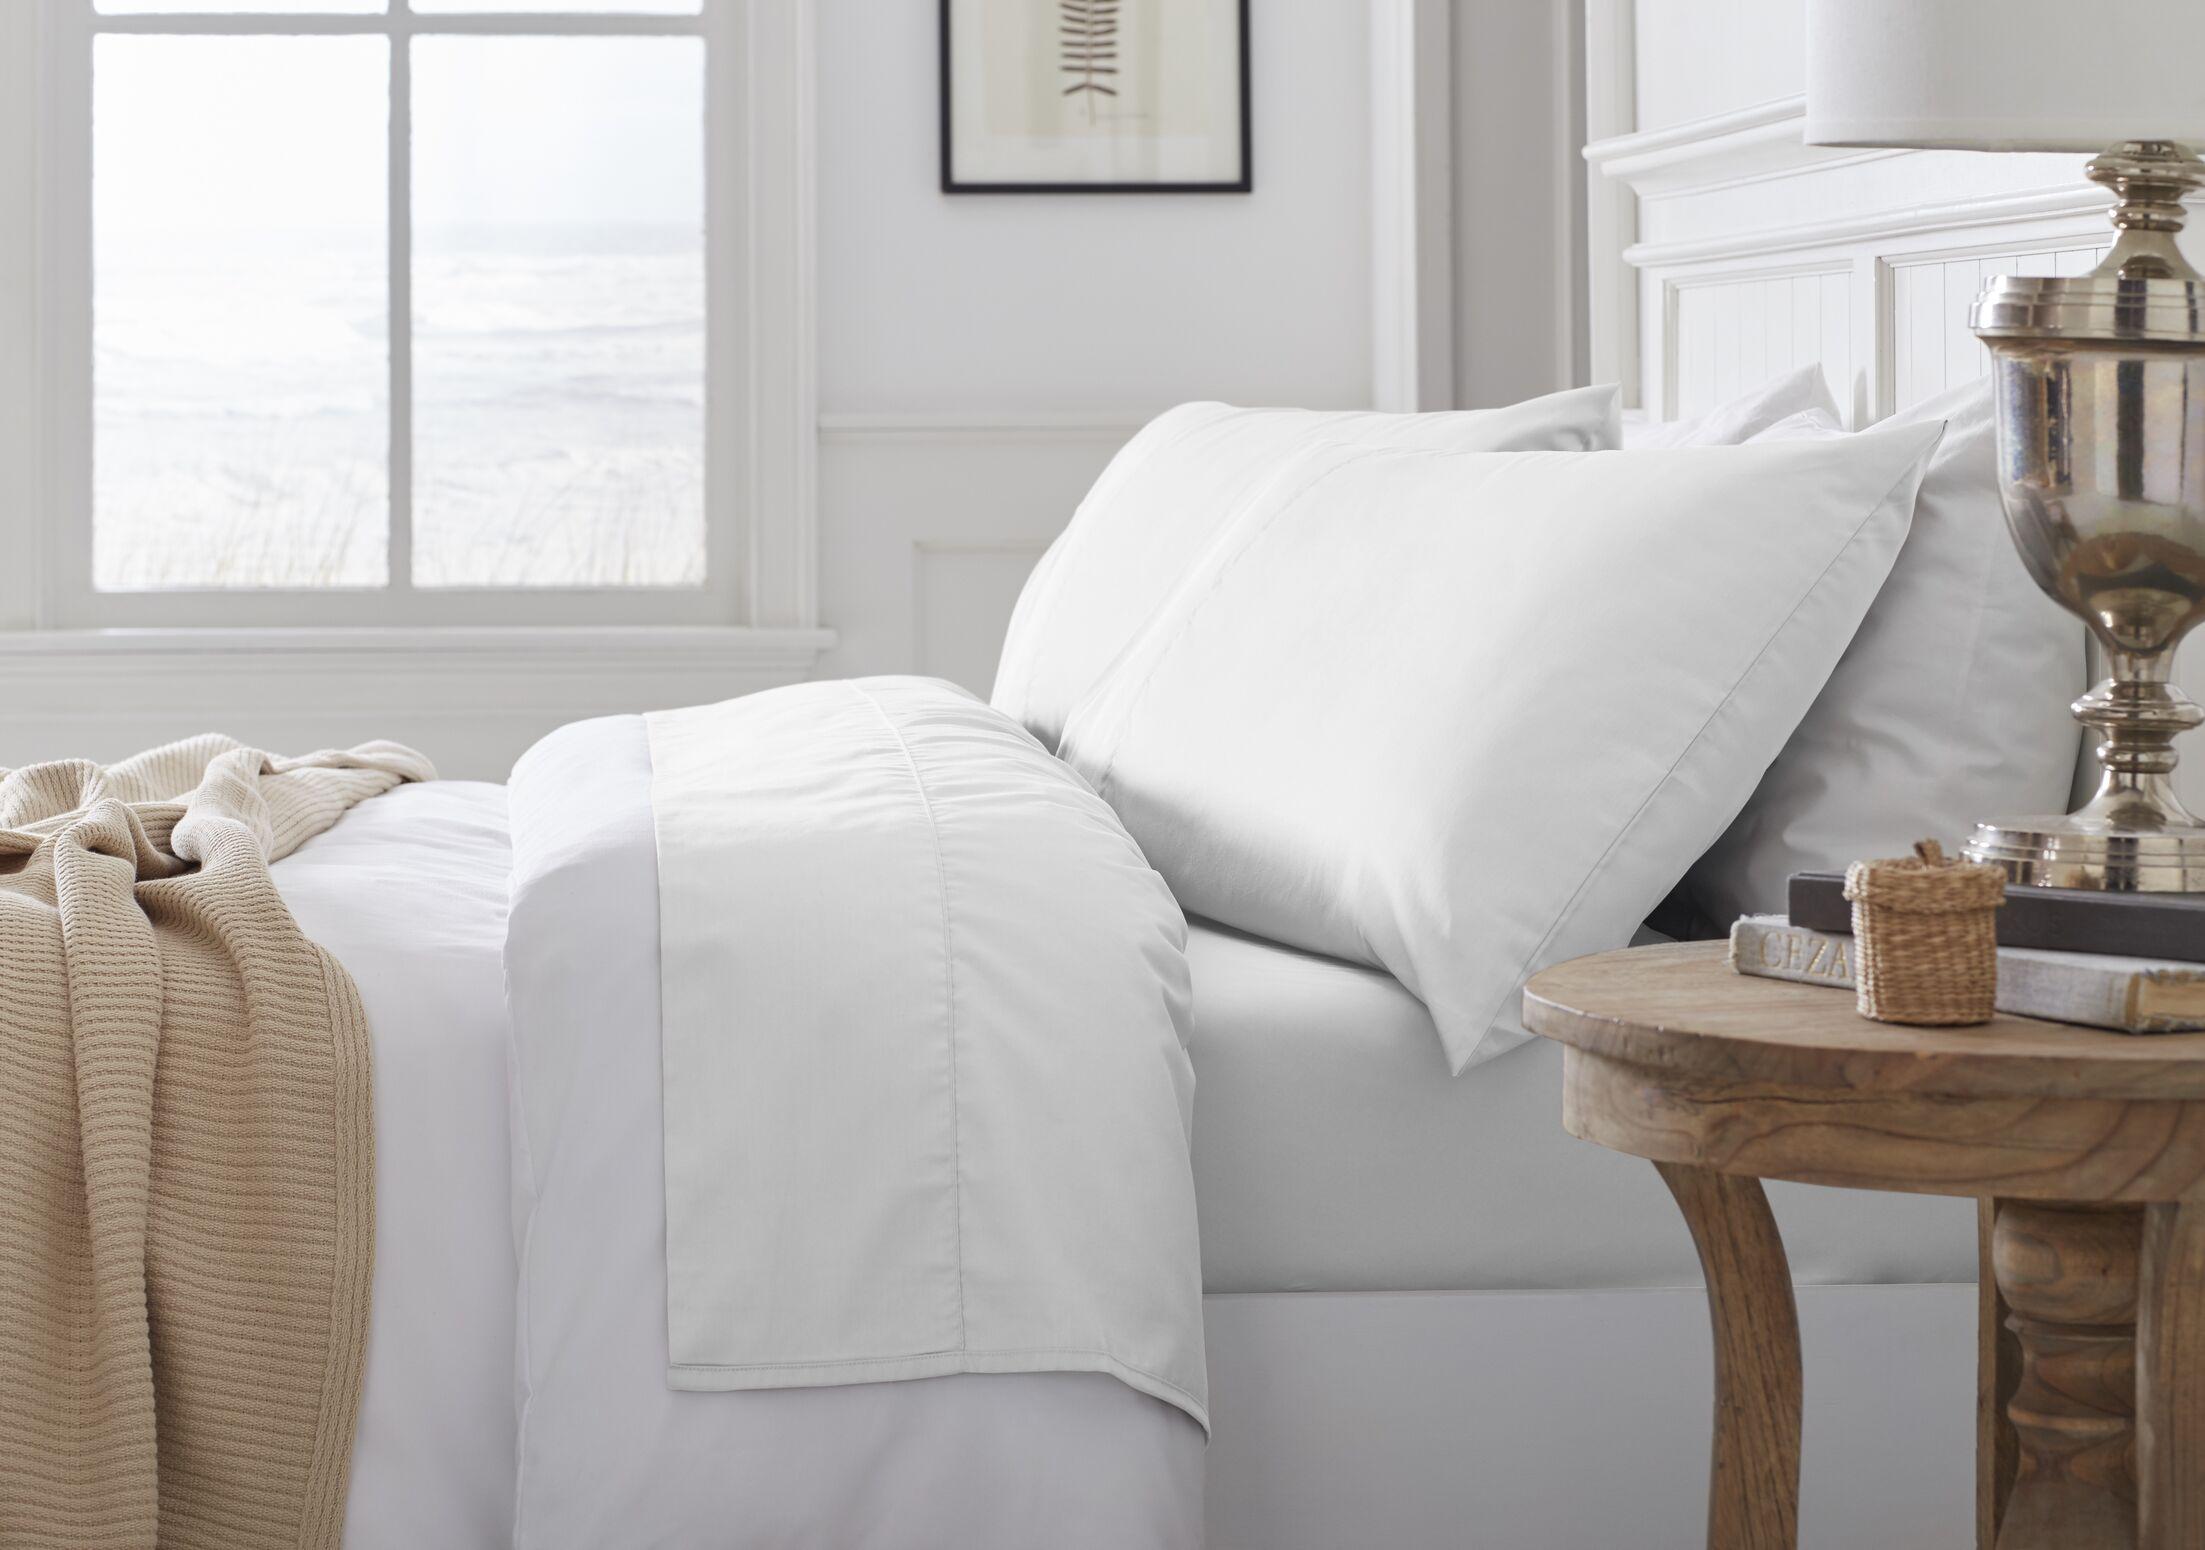 Nava Savannah 300 Thread Count 100% Organic Cotton Sheet Set Size: California King, Color: White